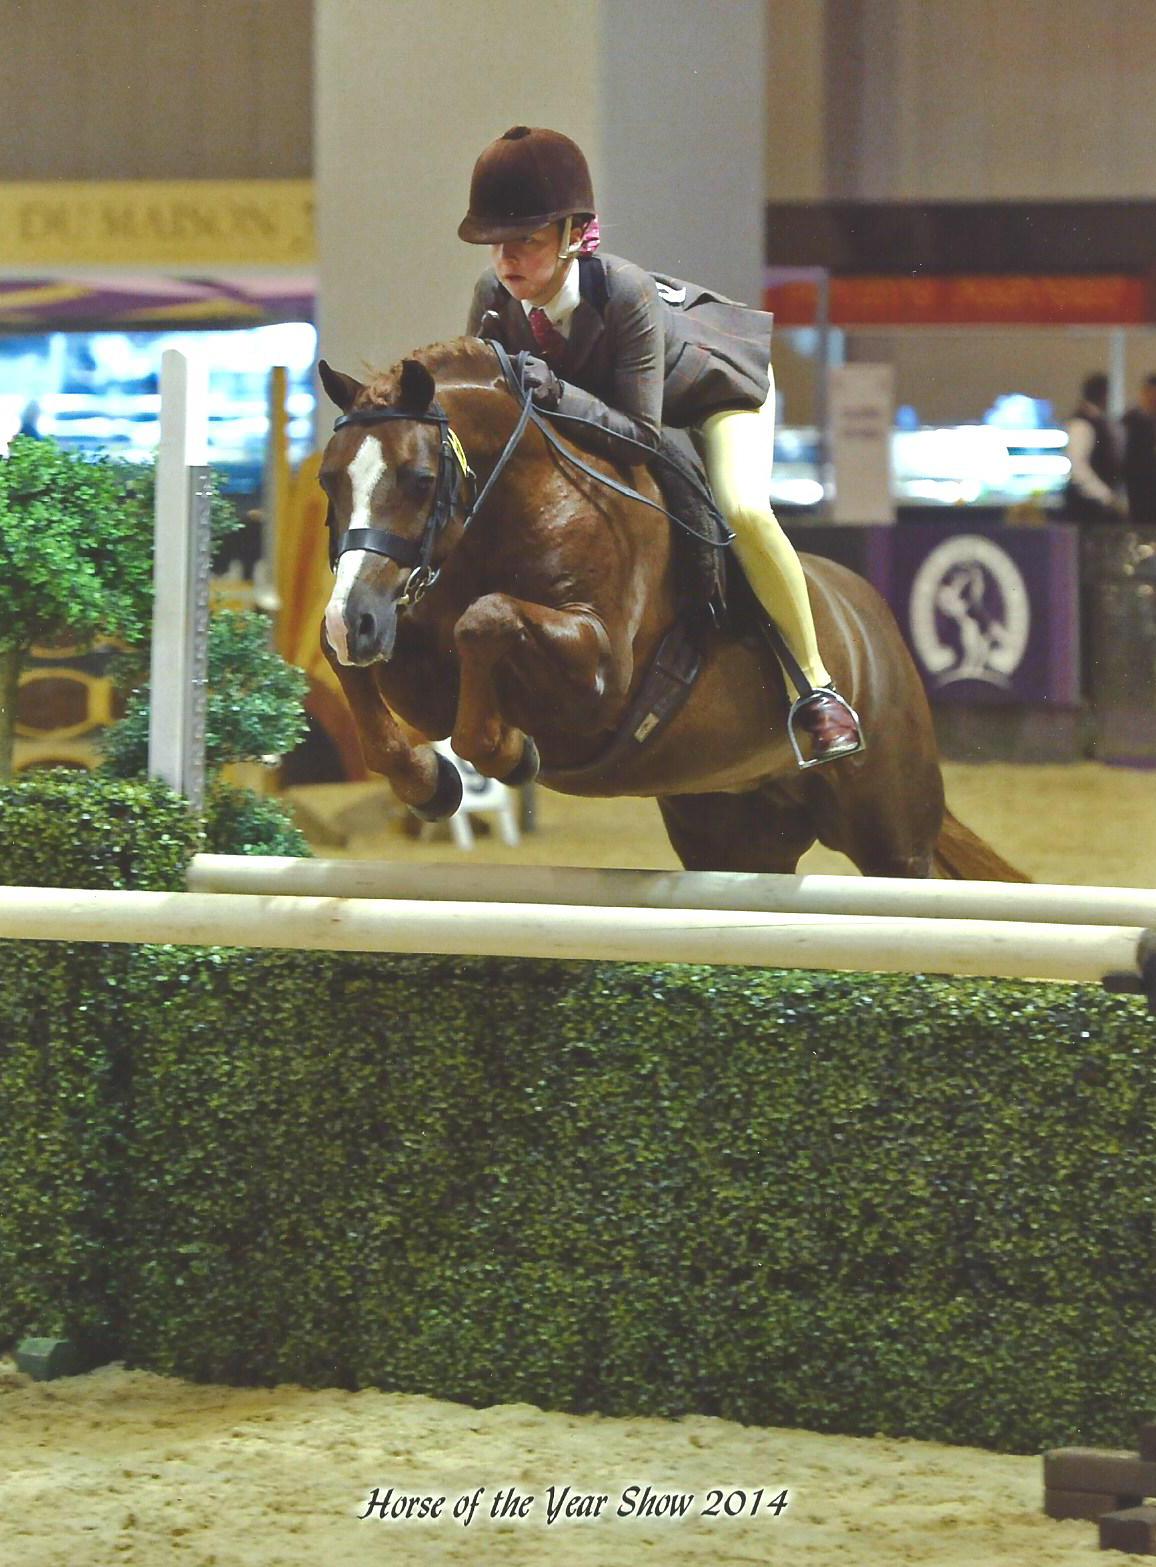 HOYS Success for Co. Antrim School Girl : Equestrian News NI